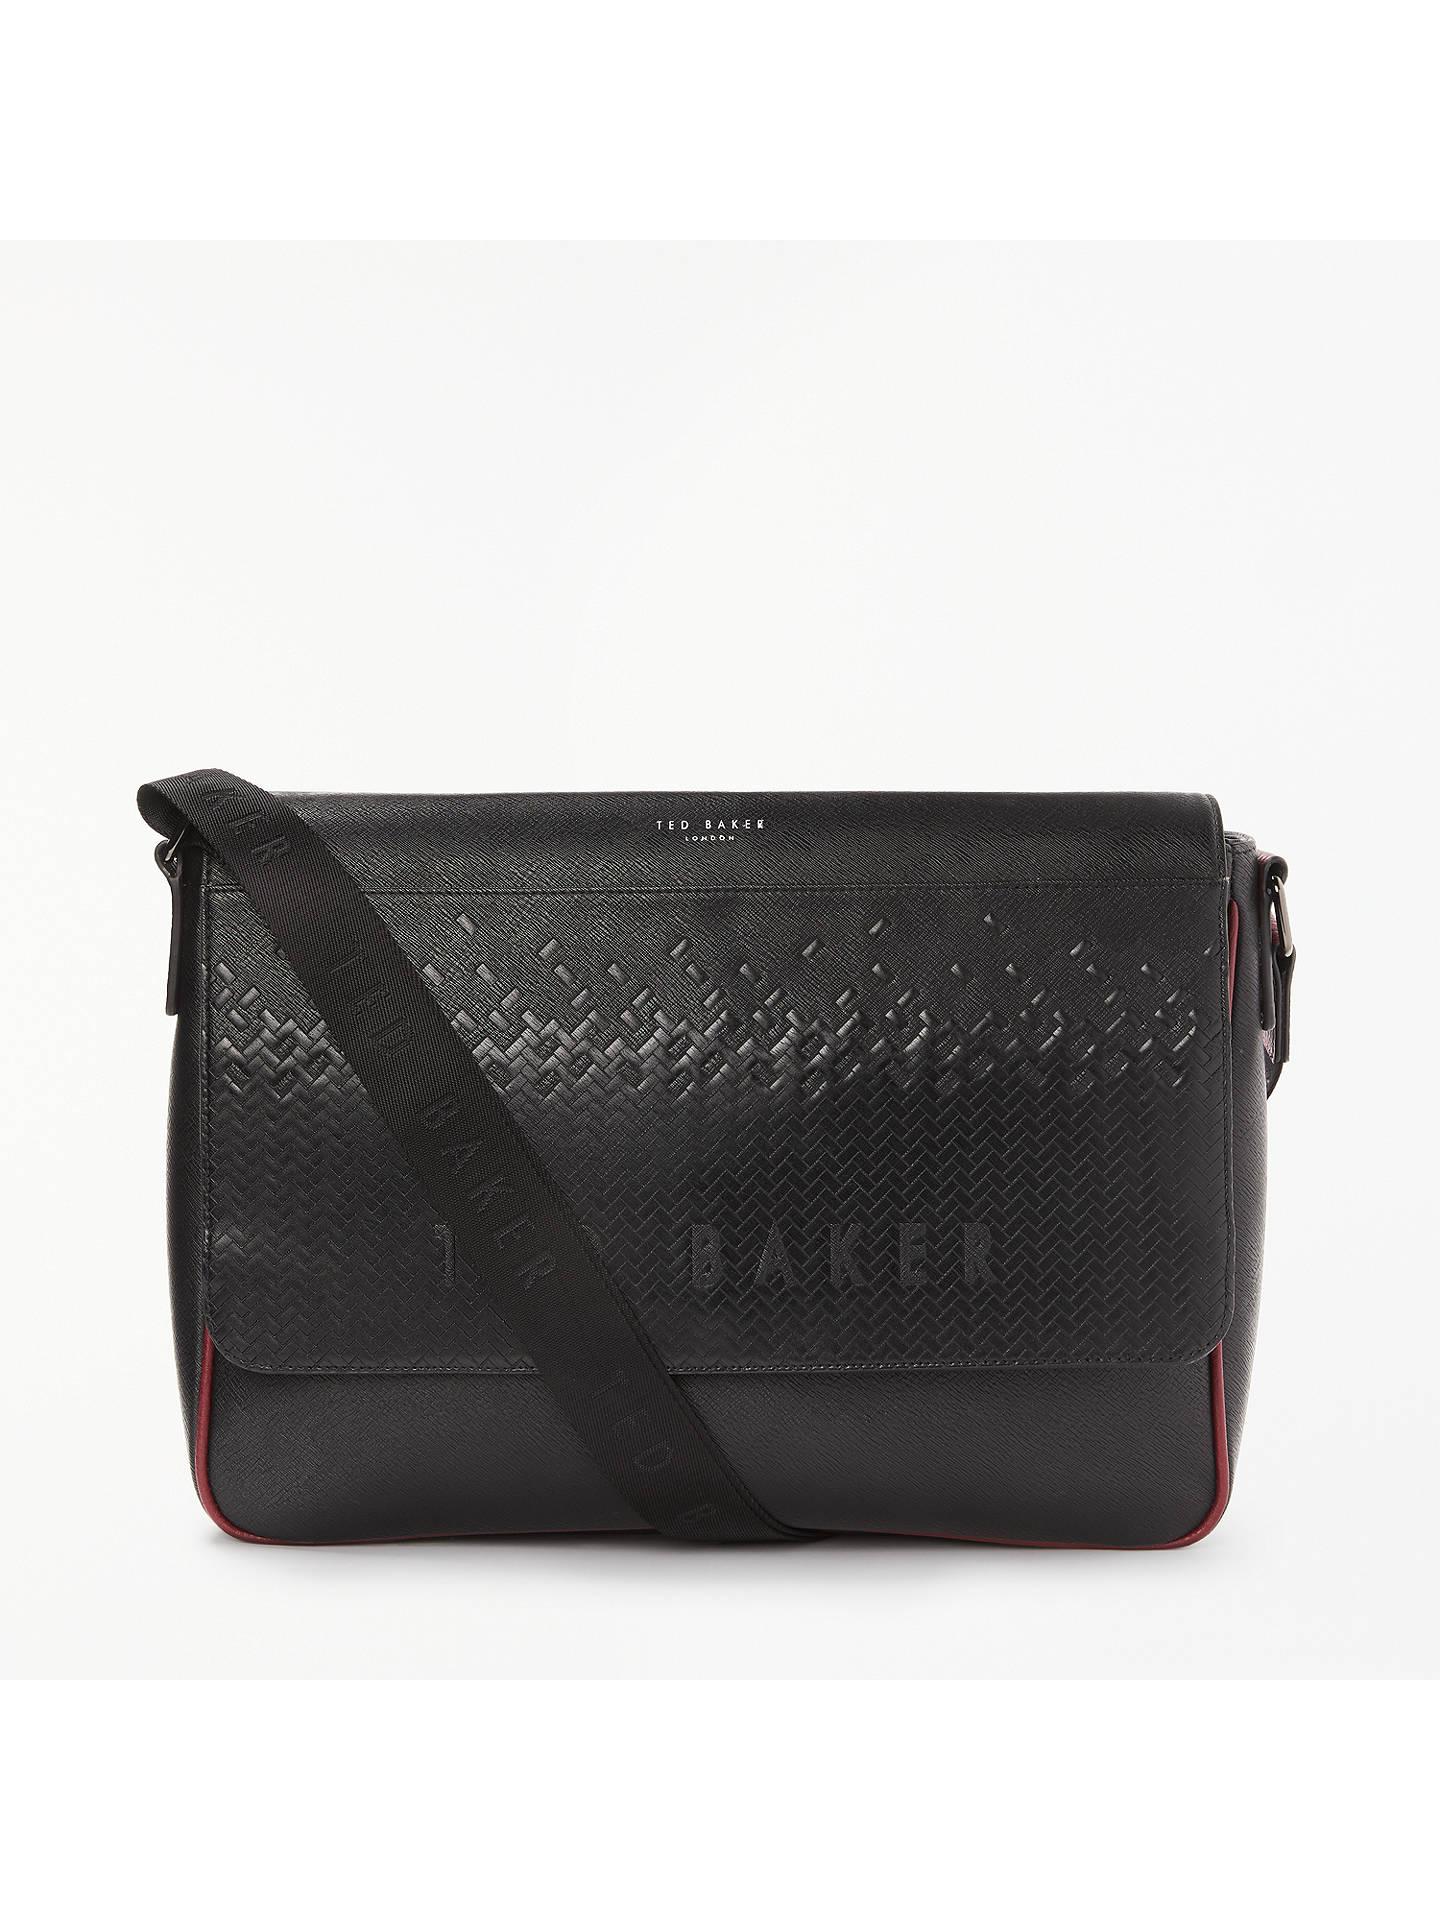 1ac92c6547c8 Buy Ted Baker Wowee Messenger Bag